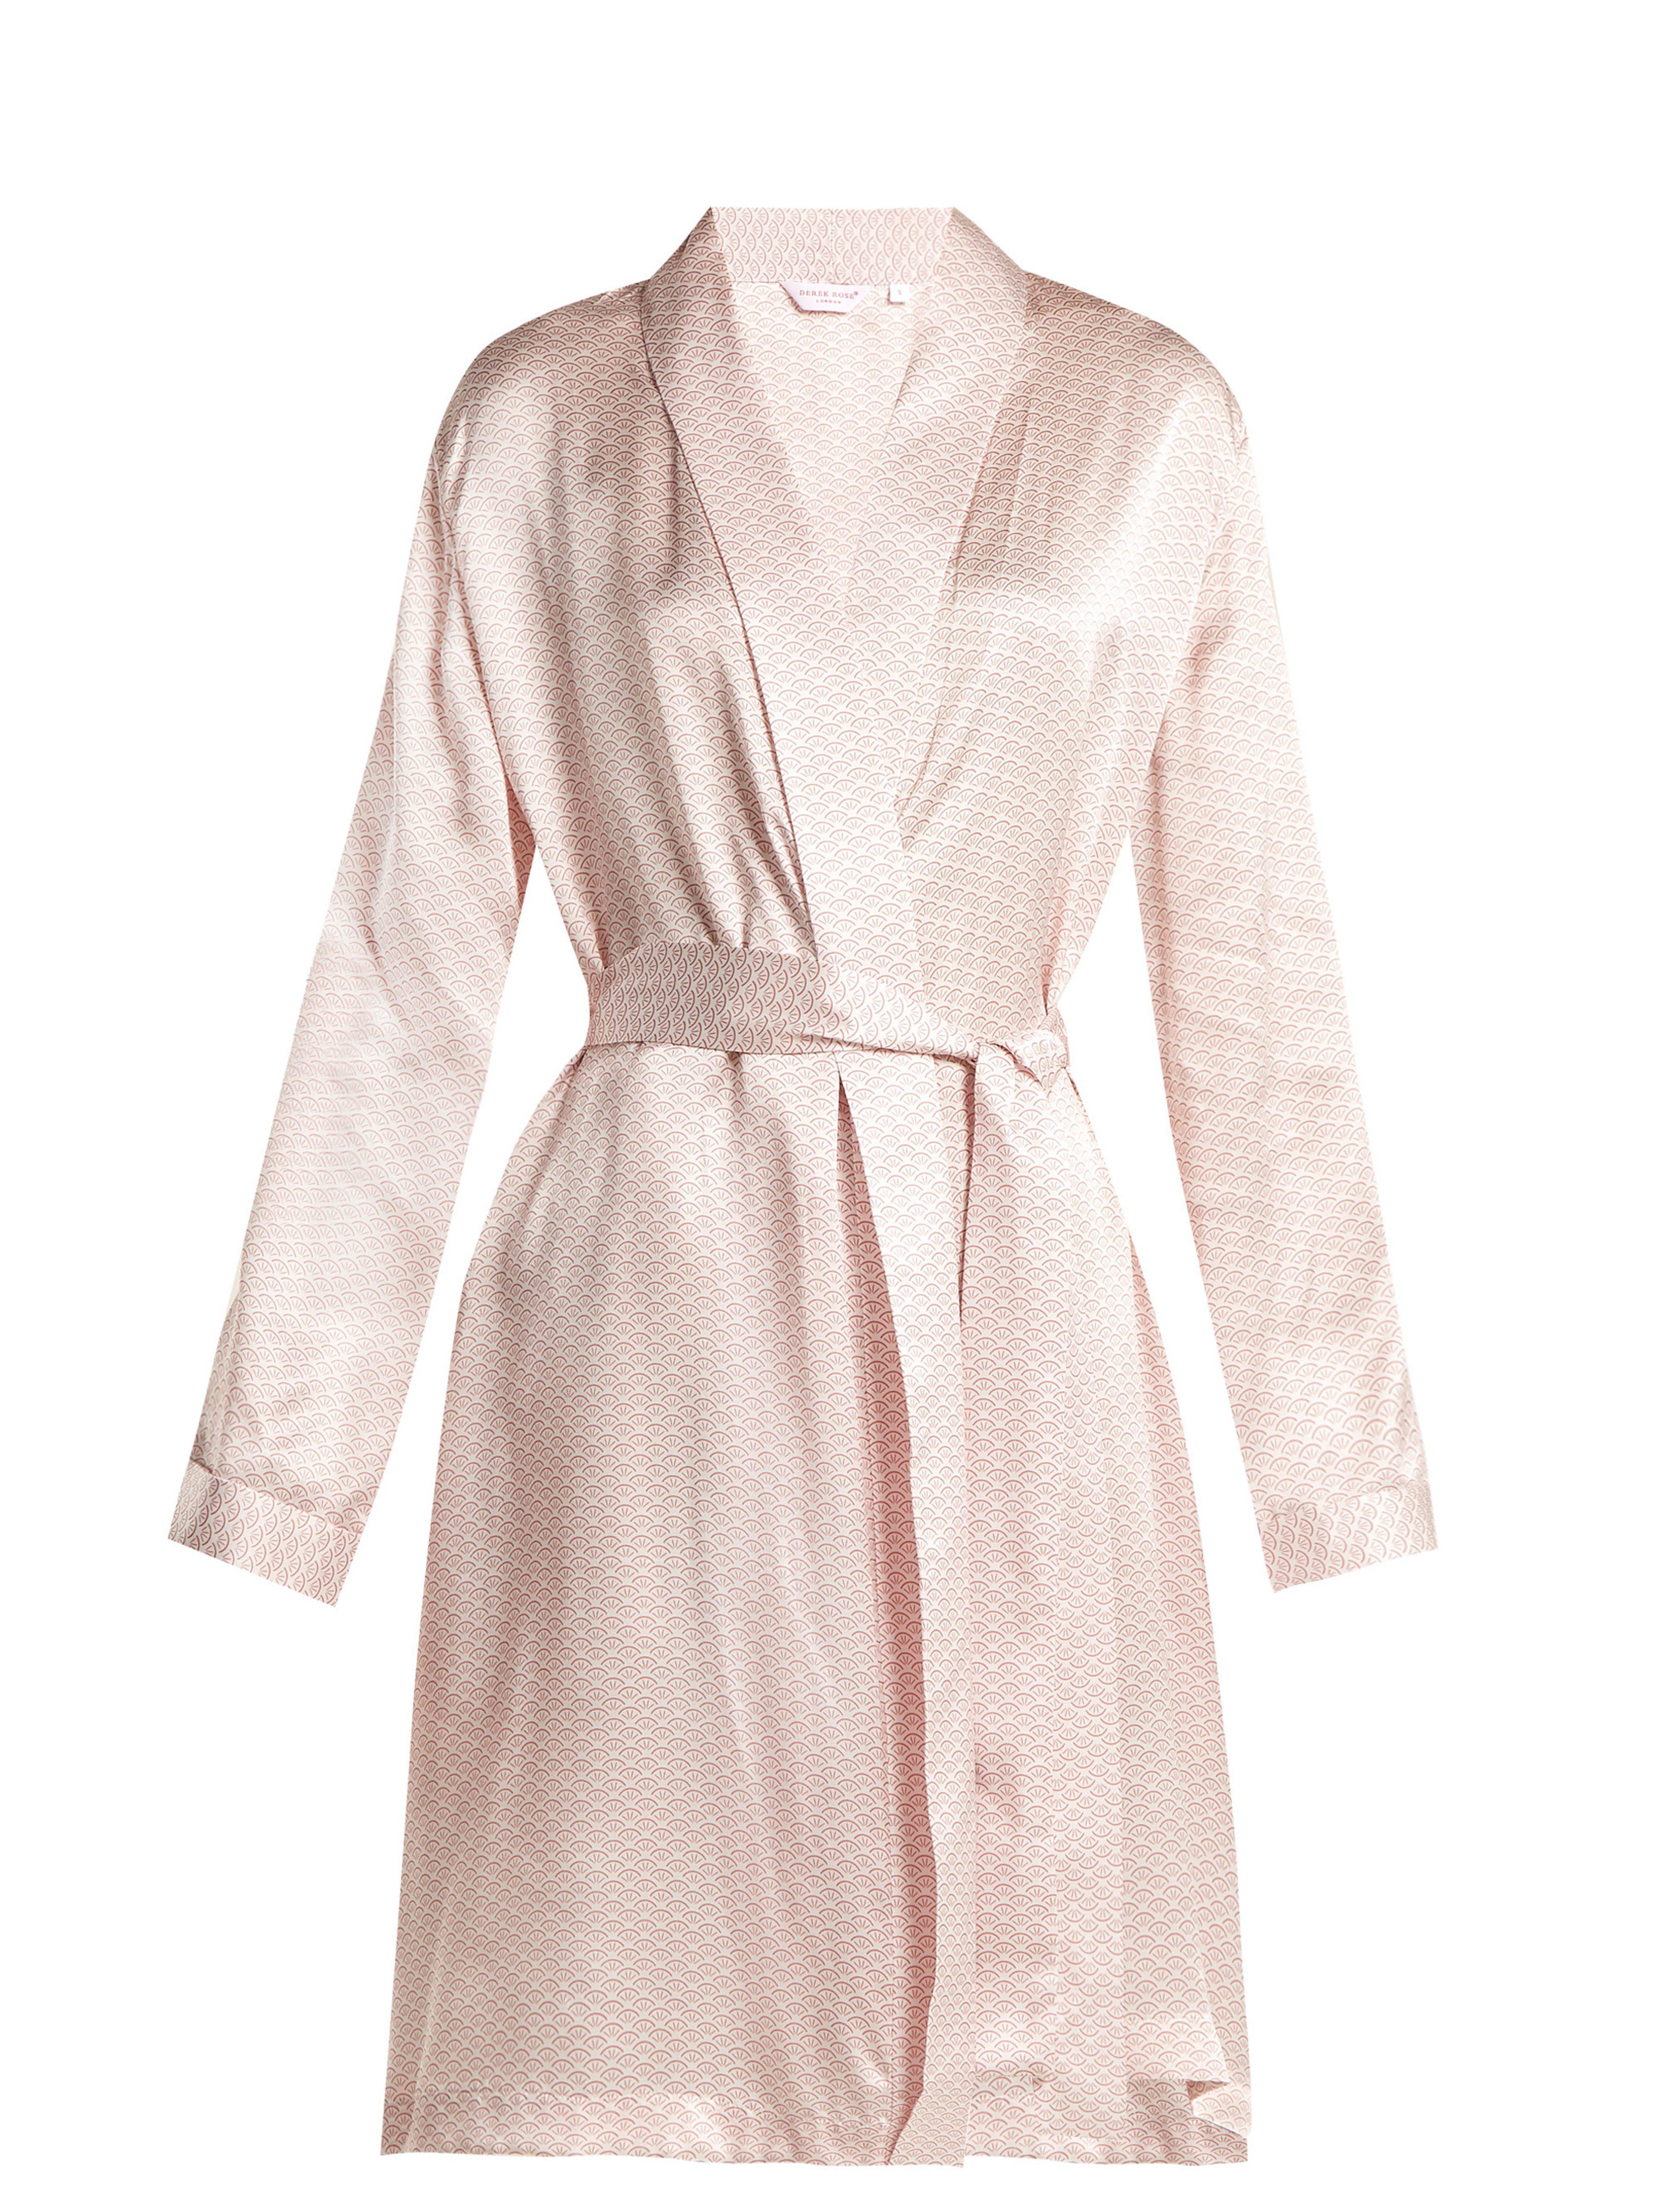 Derek Rose Brindisi 26 Kimono in Pink - Lyst 104750c52